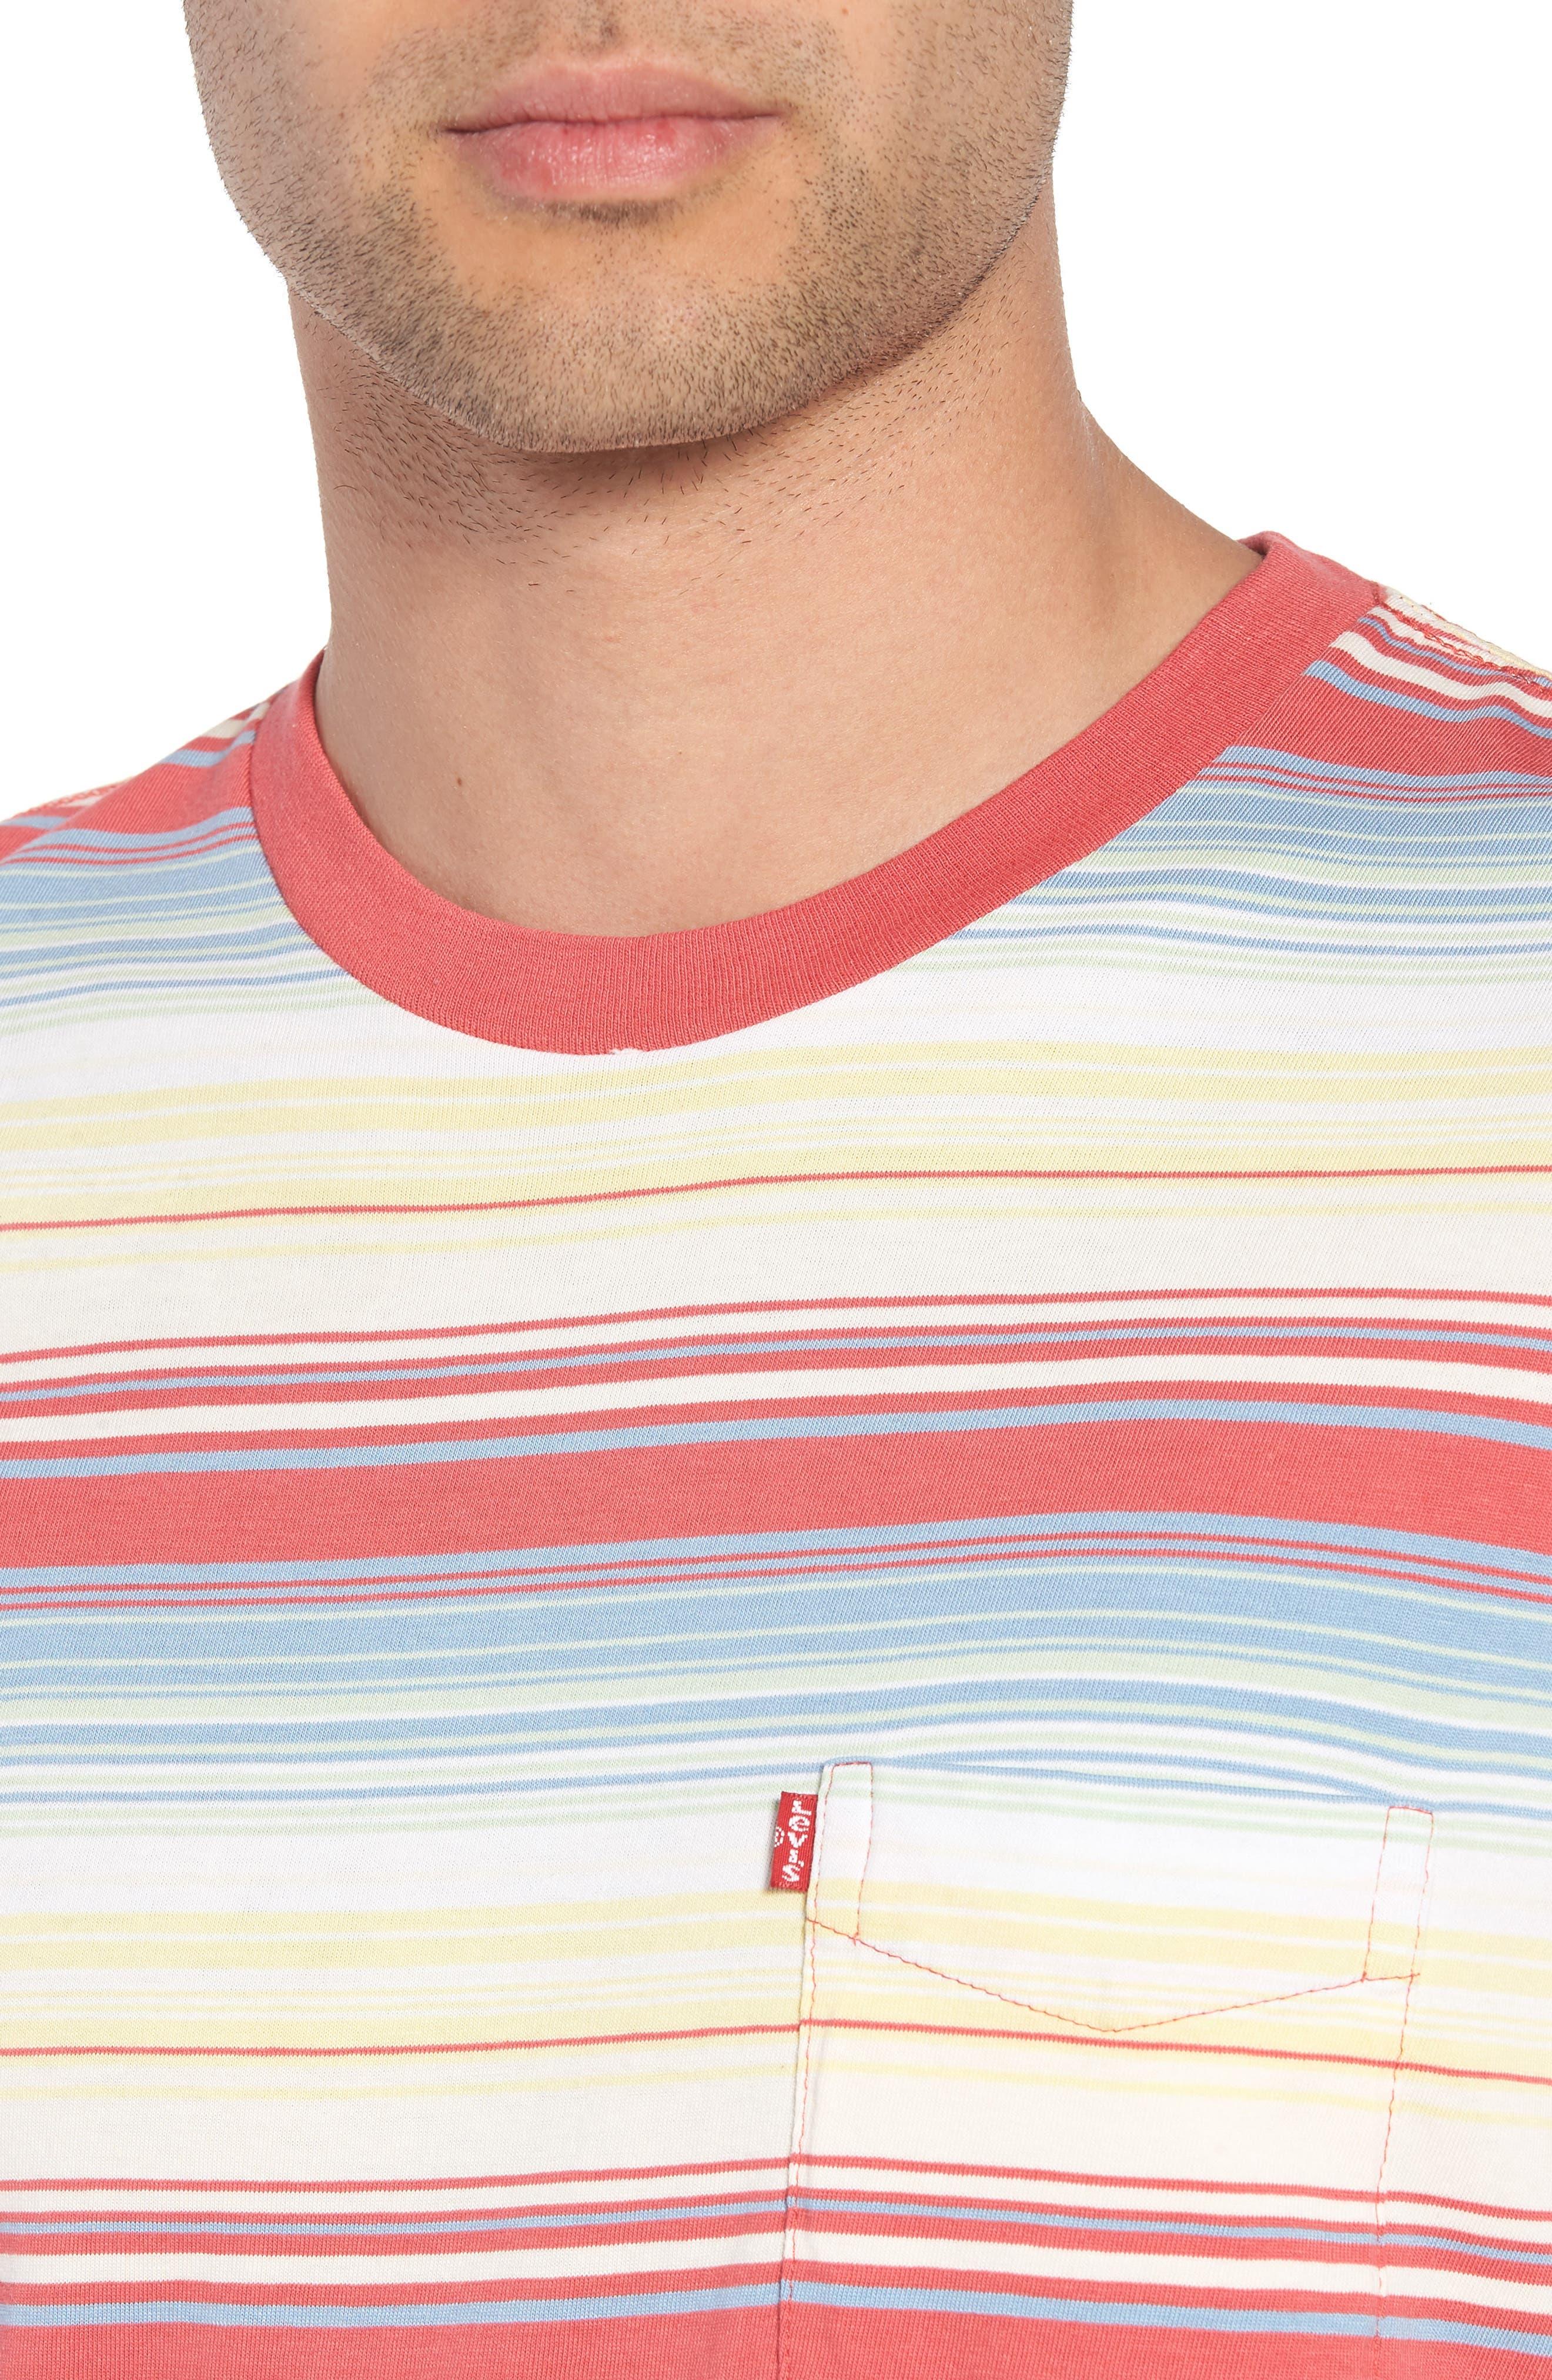 Set-In Sunset Pocket T-Shirt,                             Alternate thumbnail 4, color,                             Fiesta Stripe